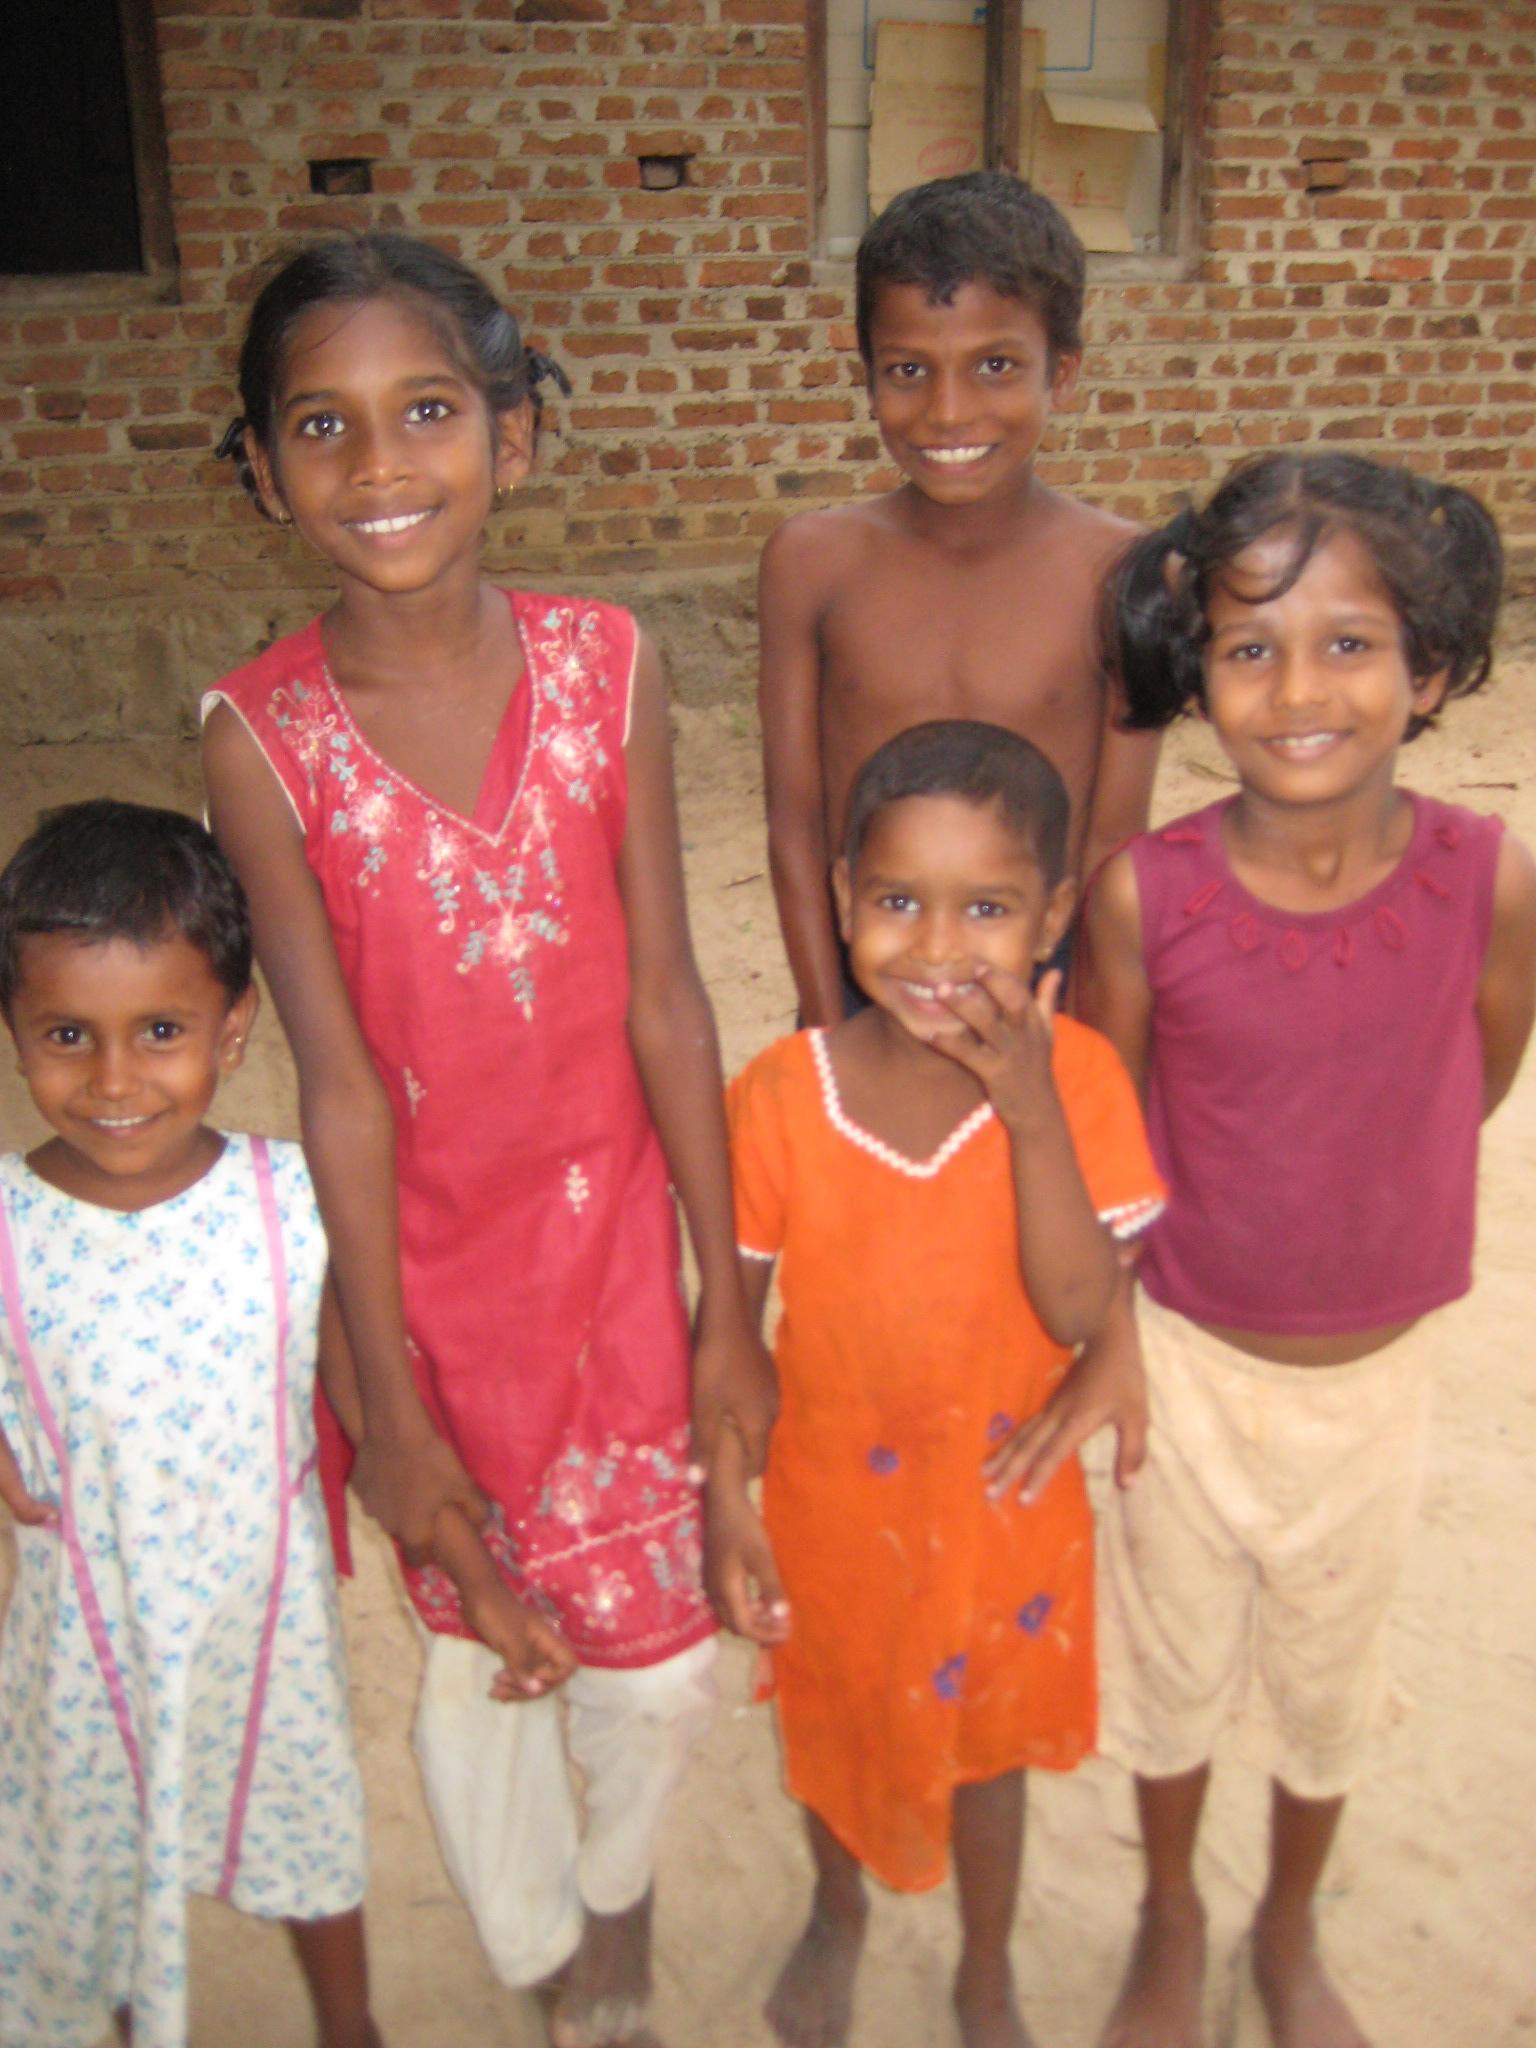 2009: Beautiful Children